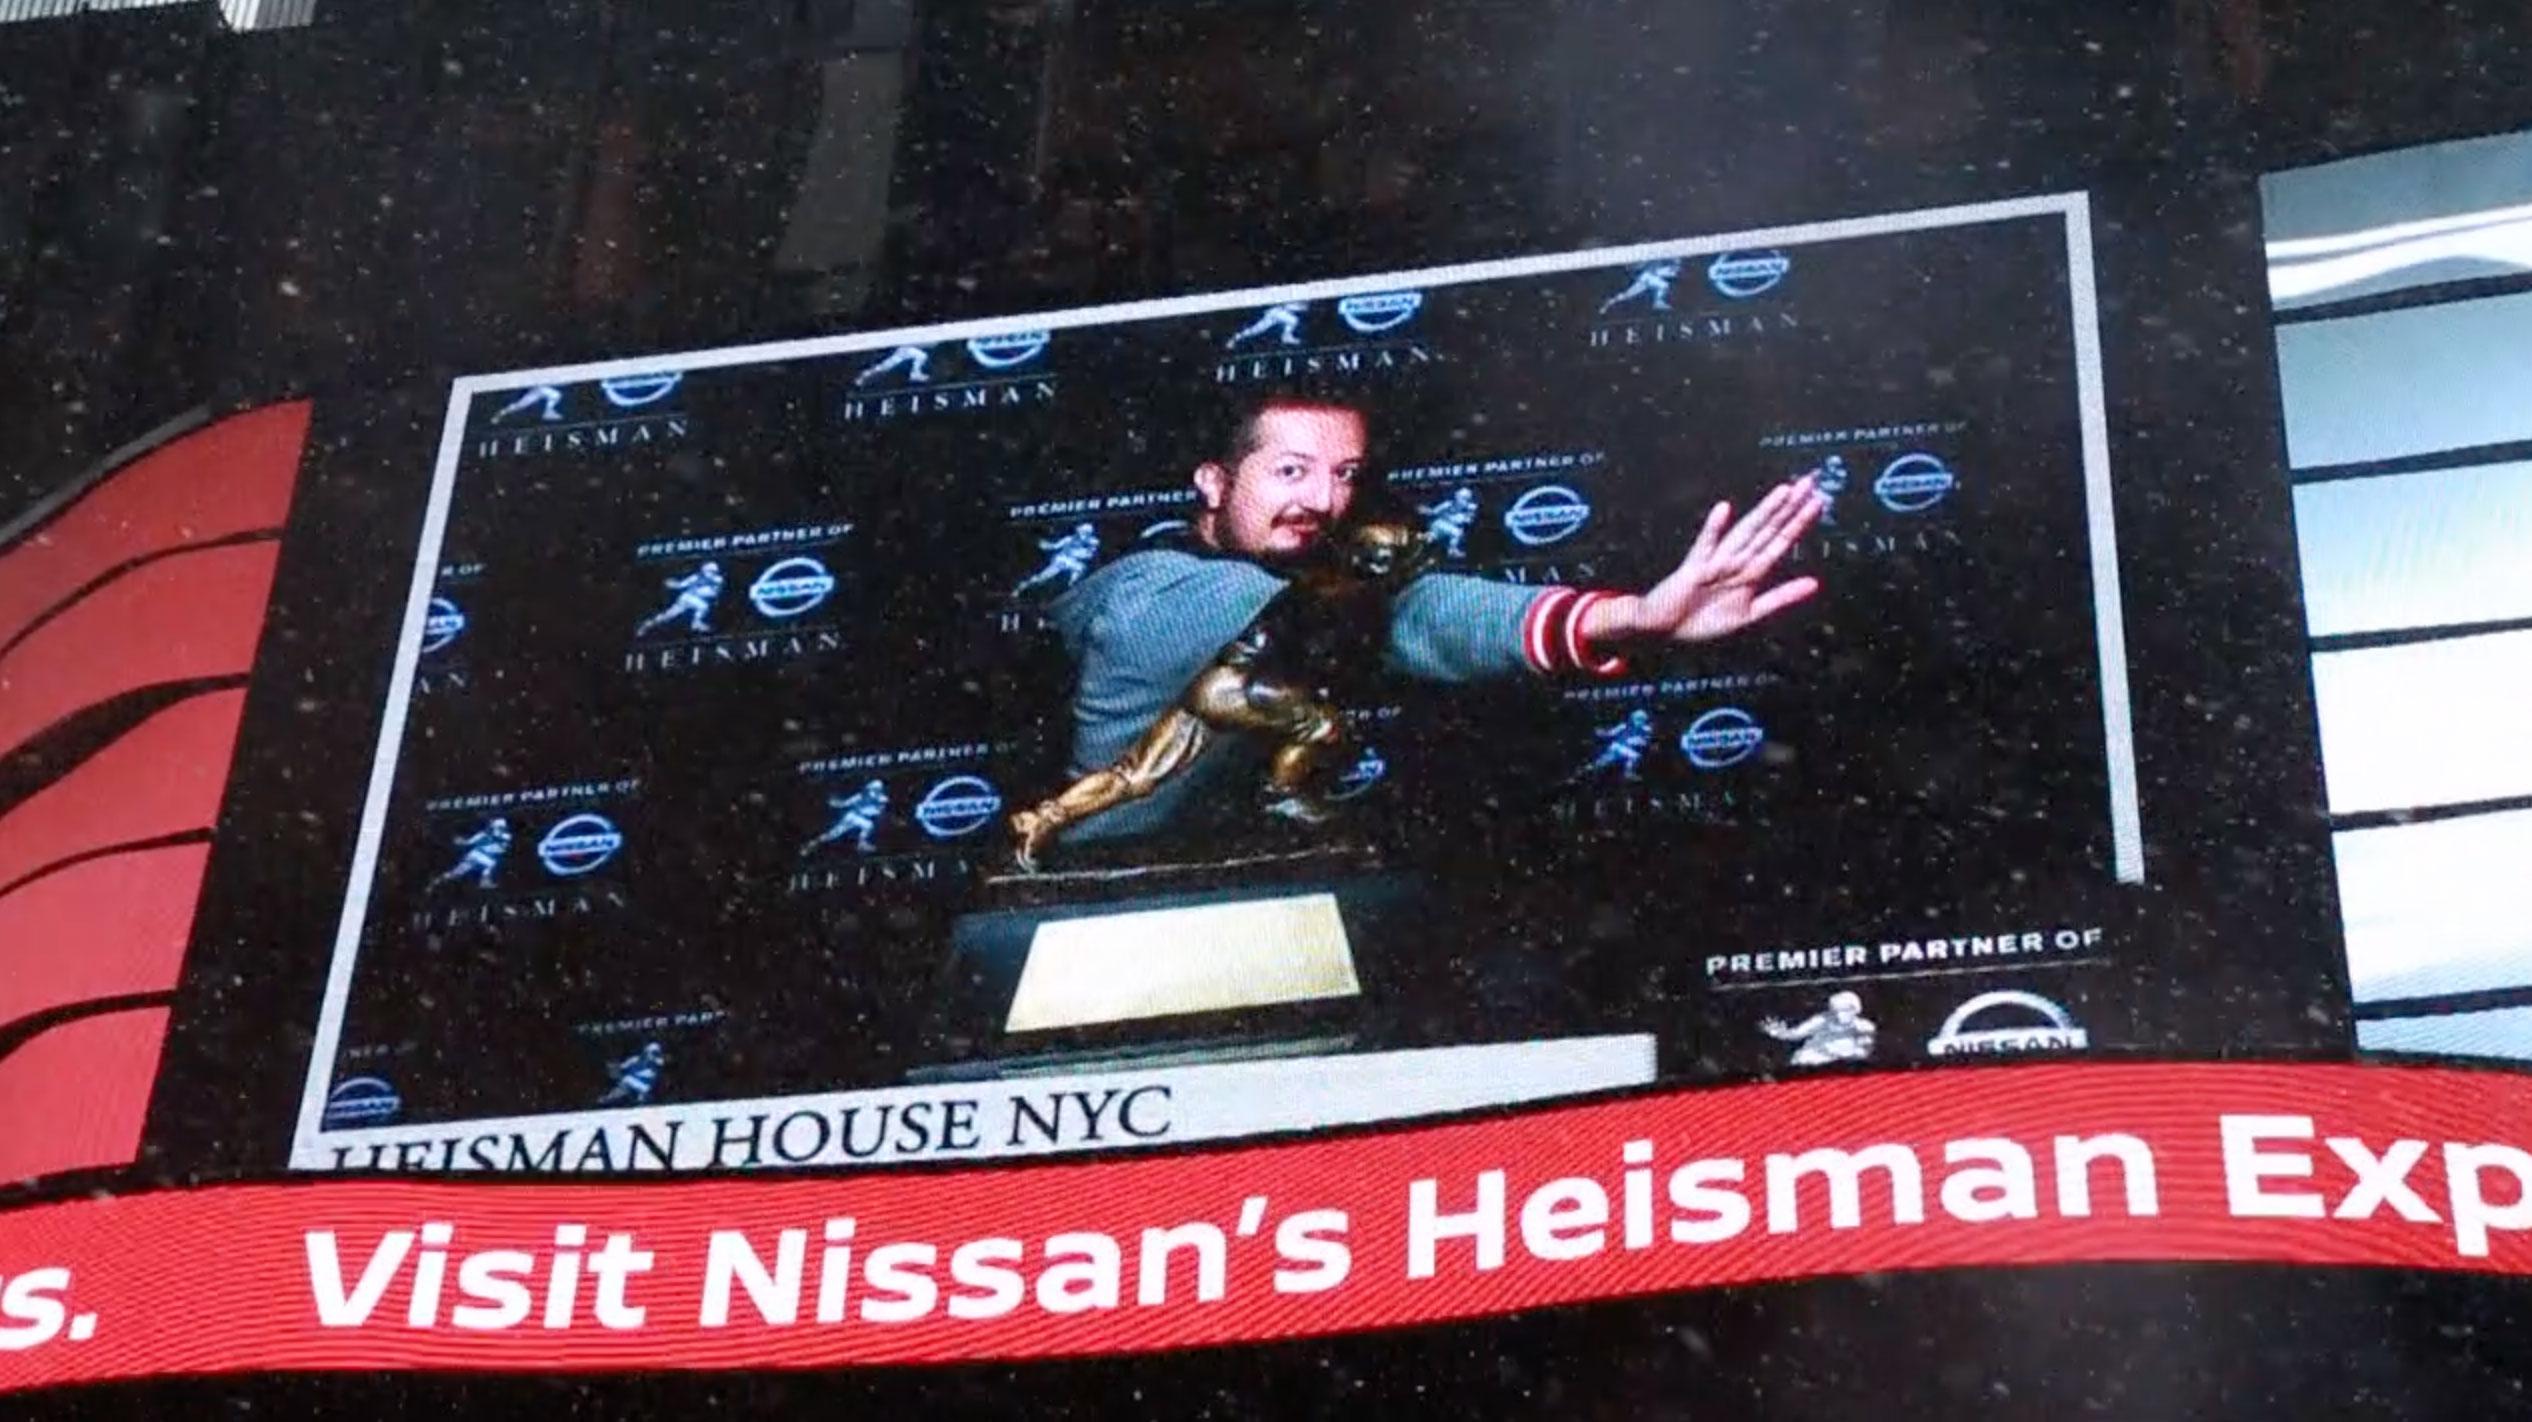 Where Is The Heisman House House Plan